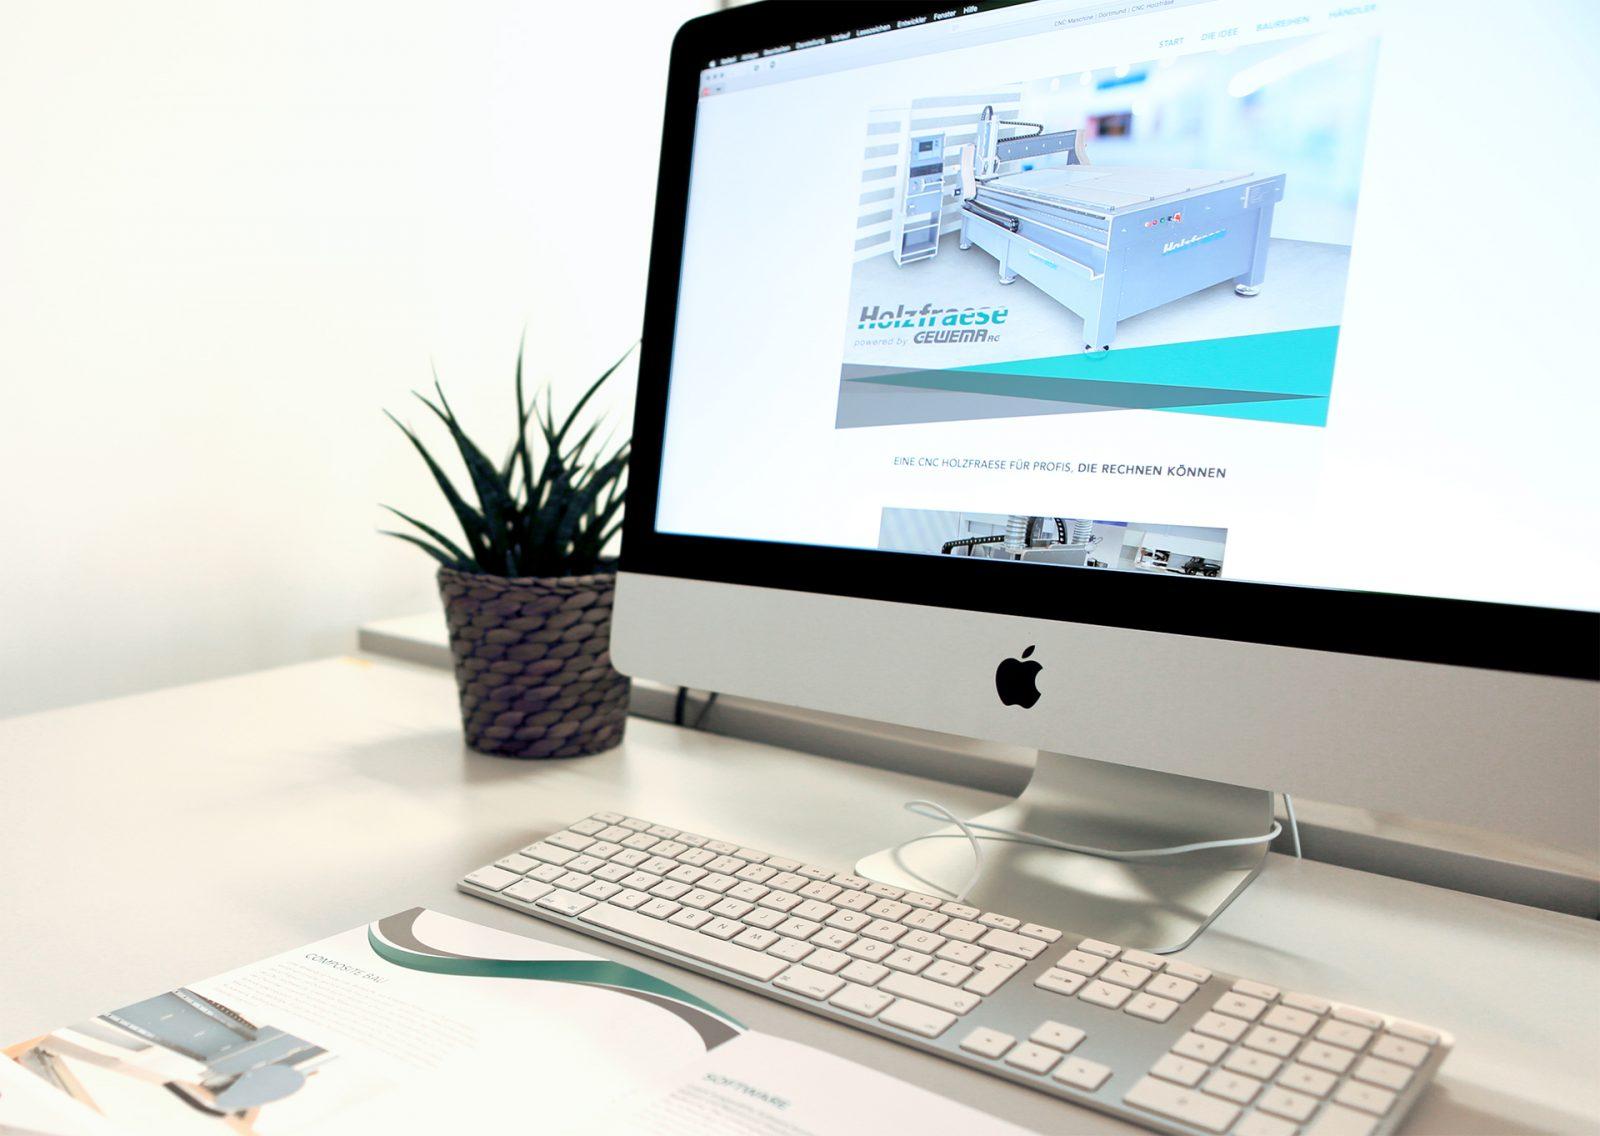 Sabath Media Werbeagentur - Gewema – Broschüre, Landingpage & Video - Referenzbild 1